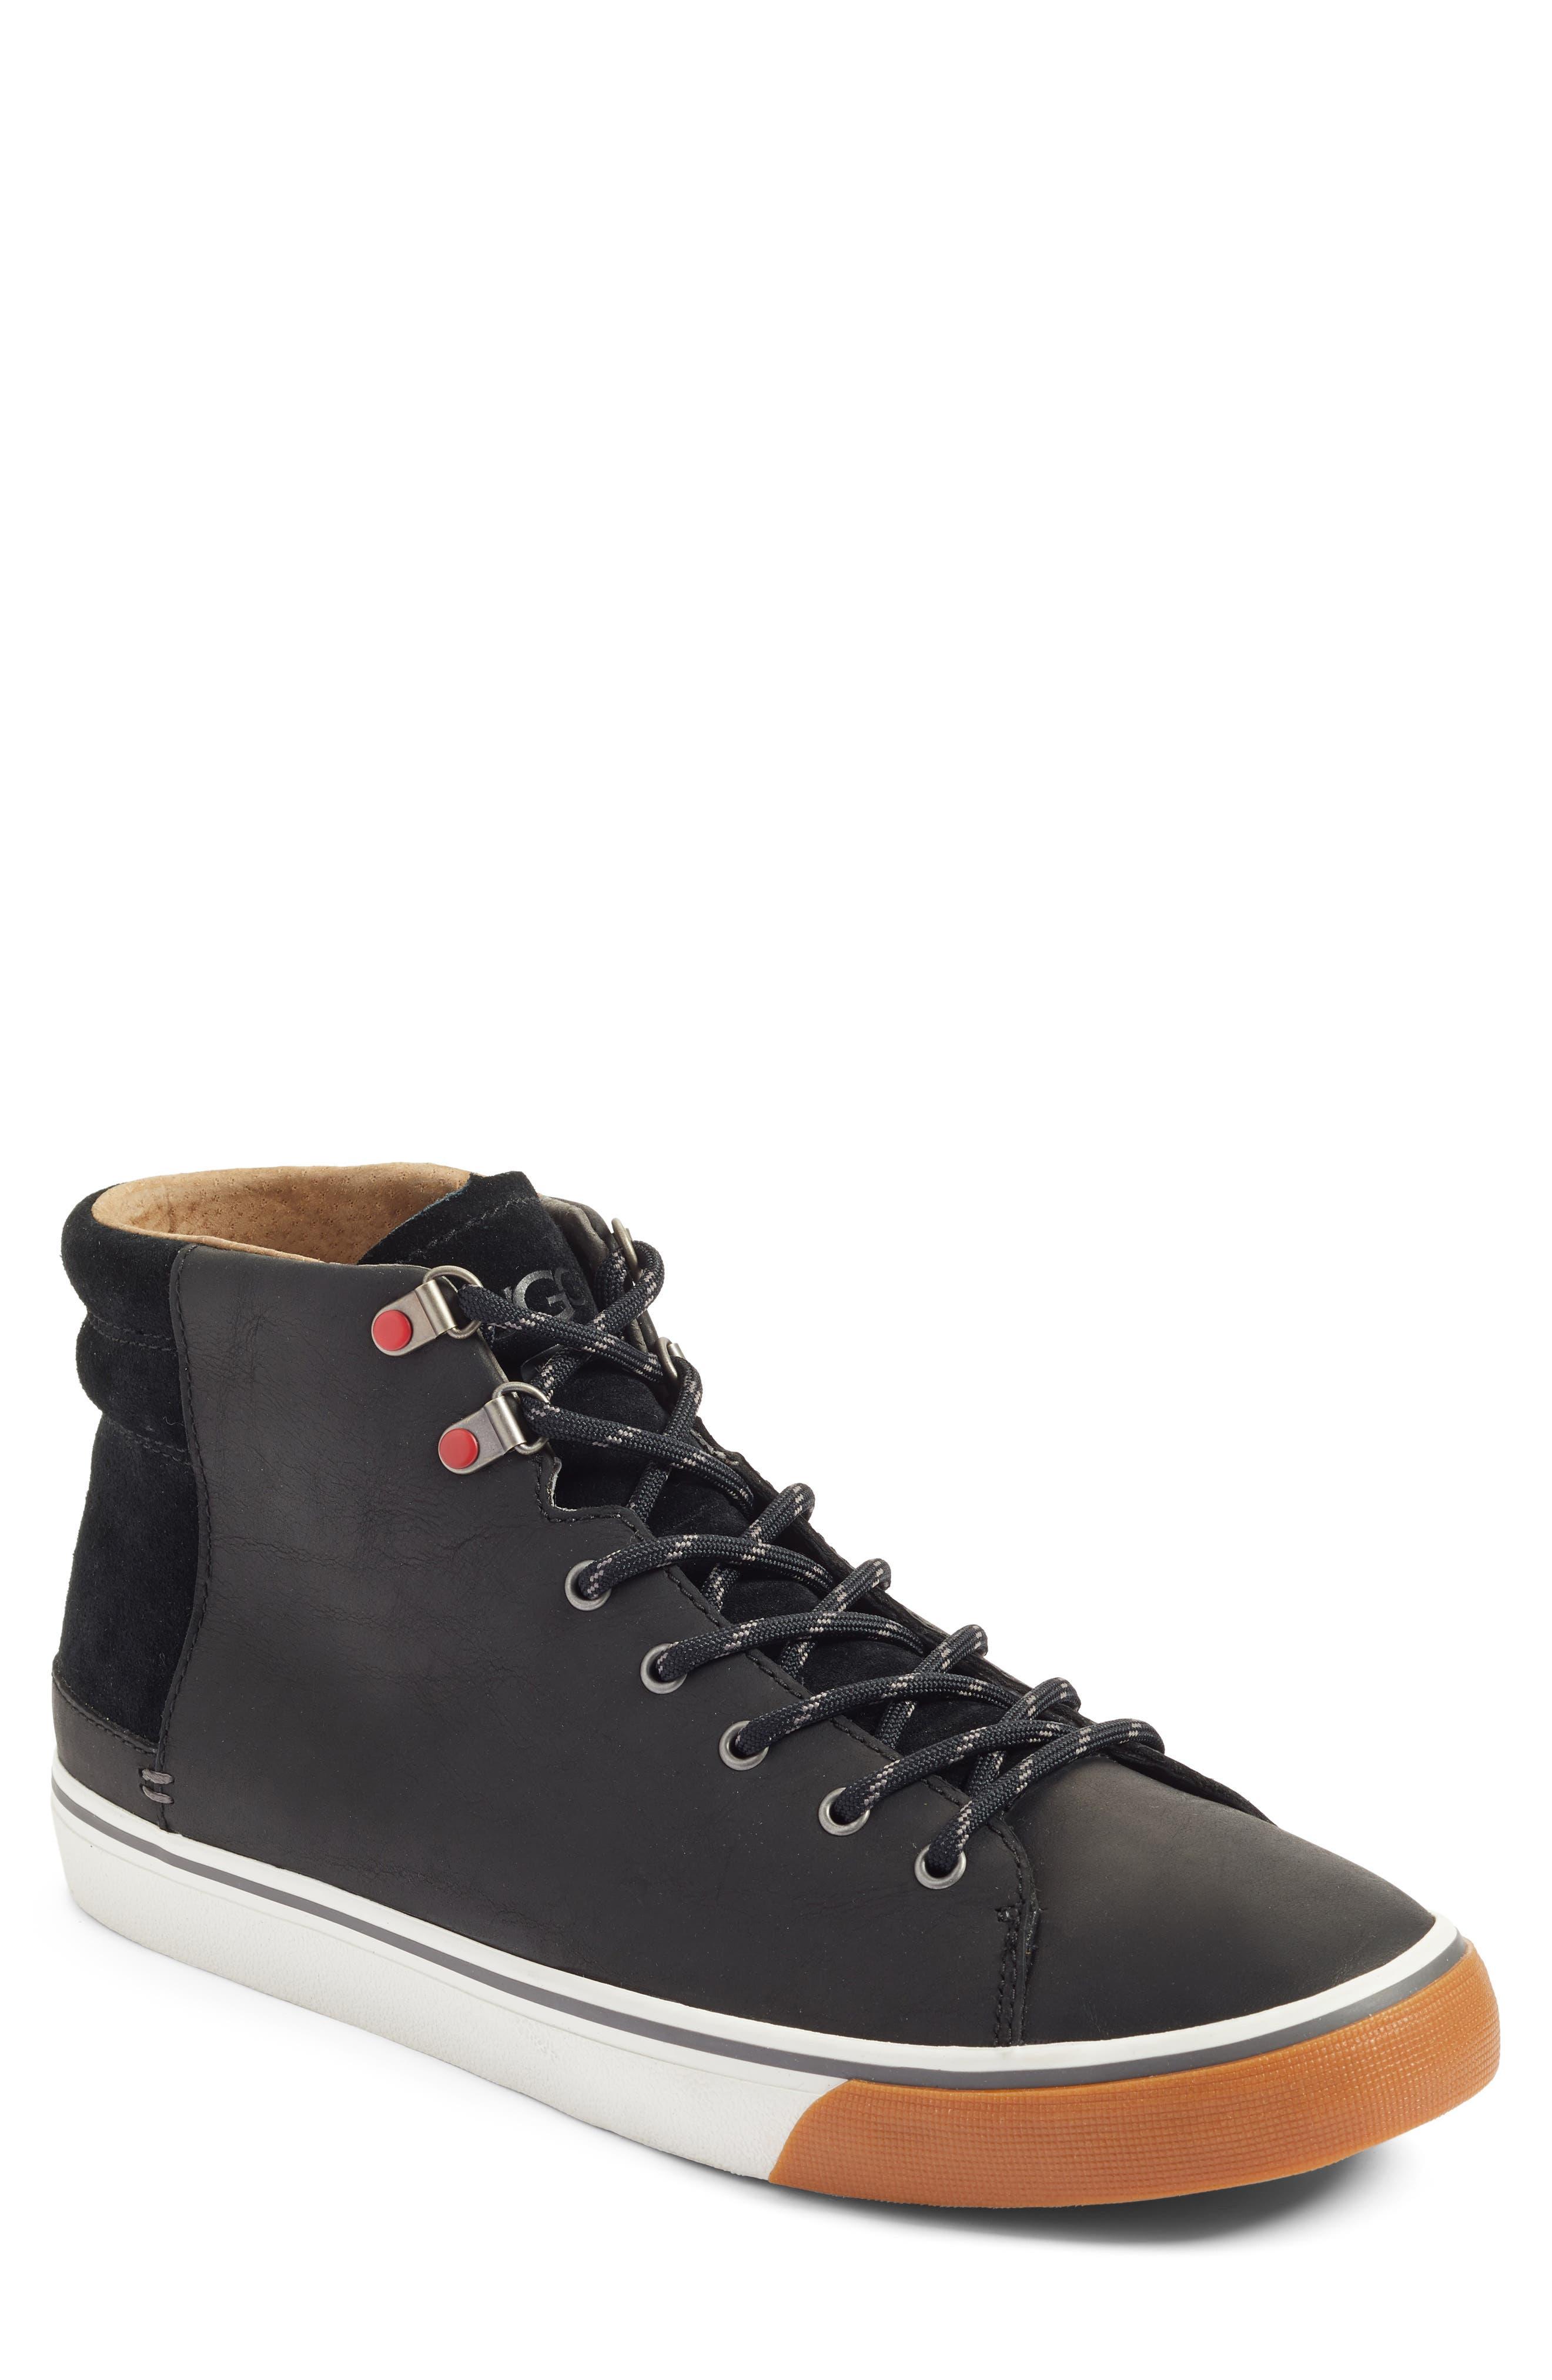 Hoyt High Top Sneaker,                             Main thumbnail 1, color,                             001